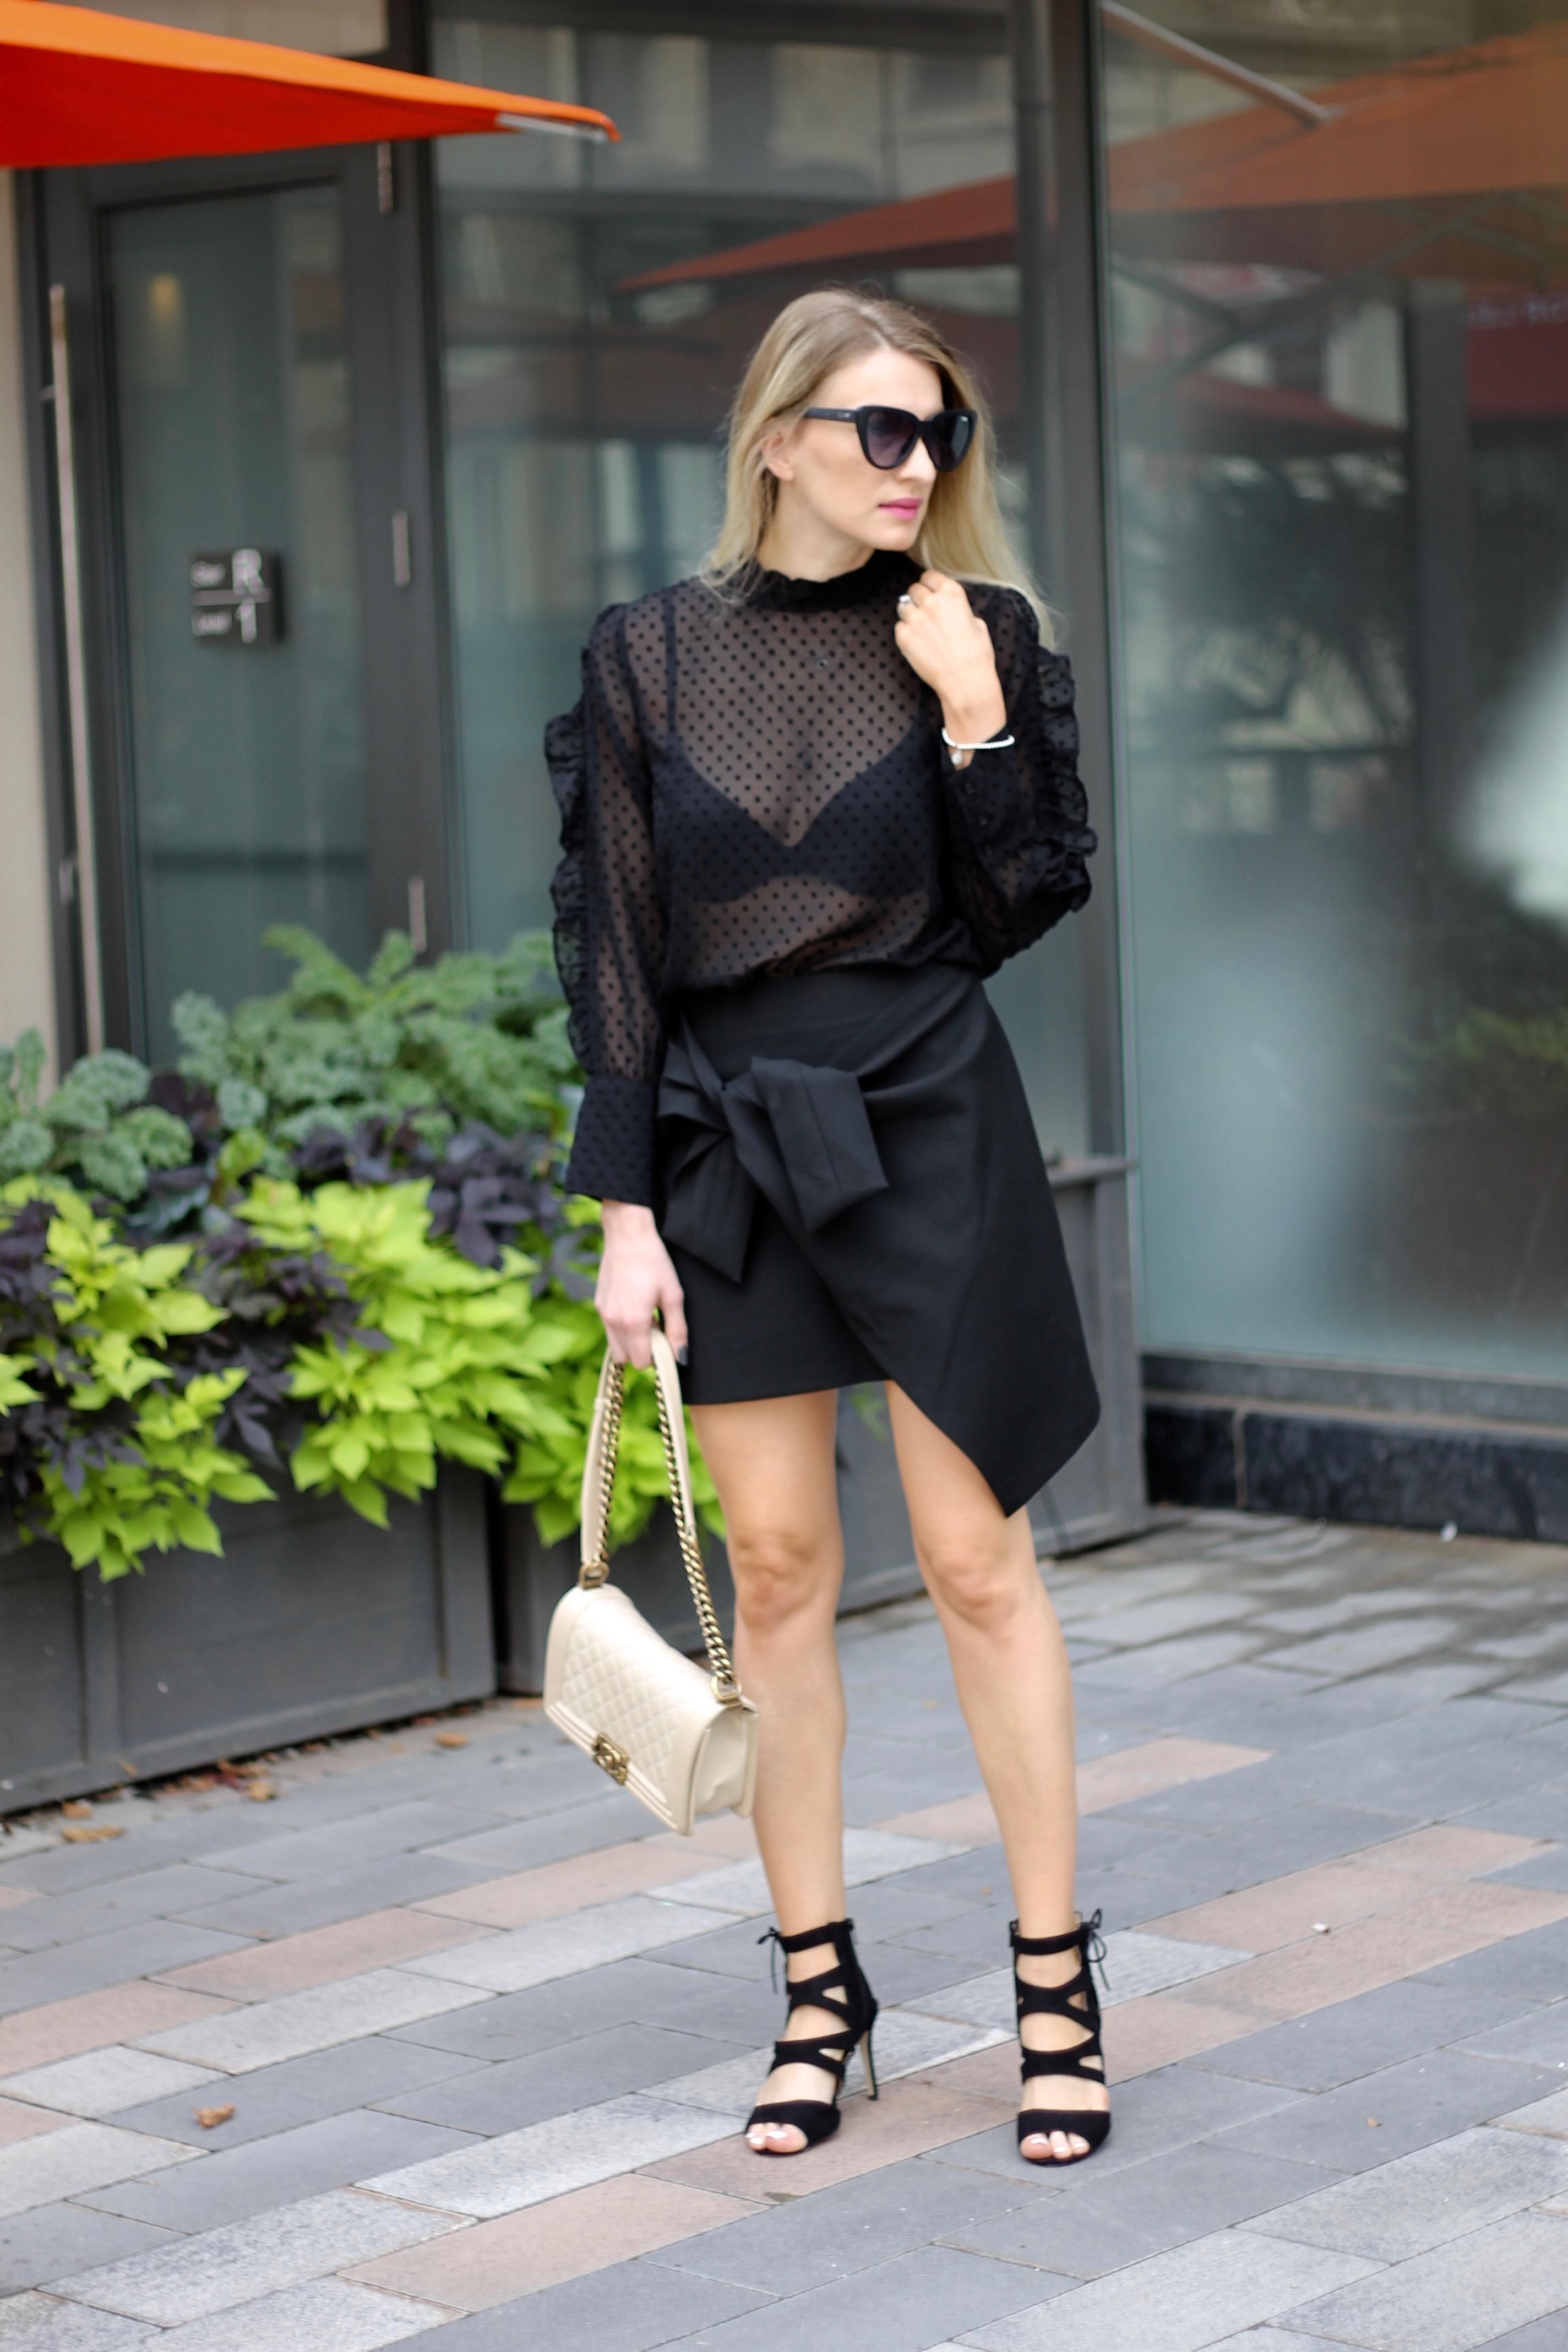 MON MODE | BLOGGER | Toronto Blogger | Fall Fashion | Ruffles and Bows